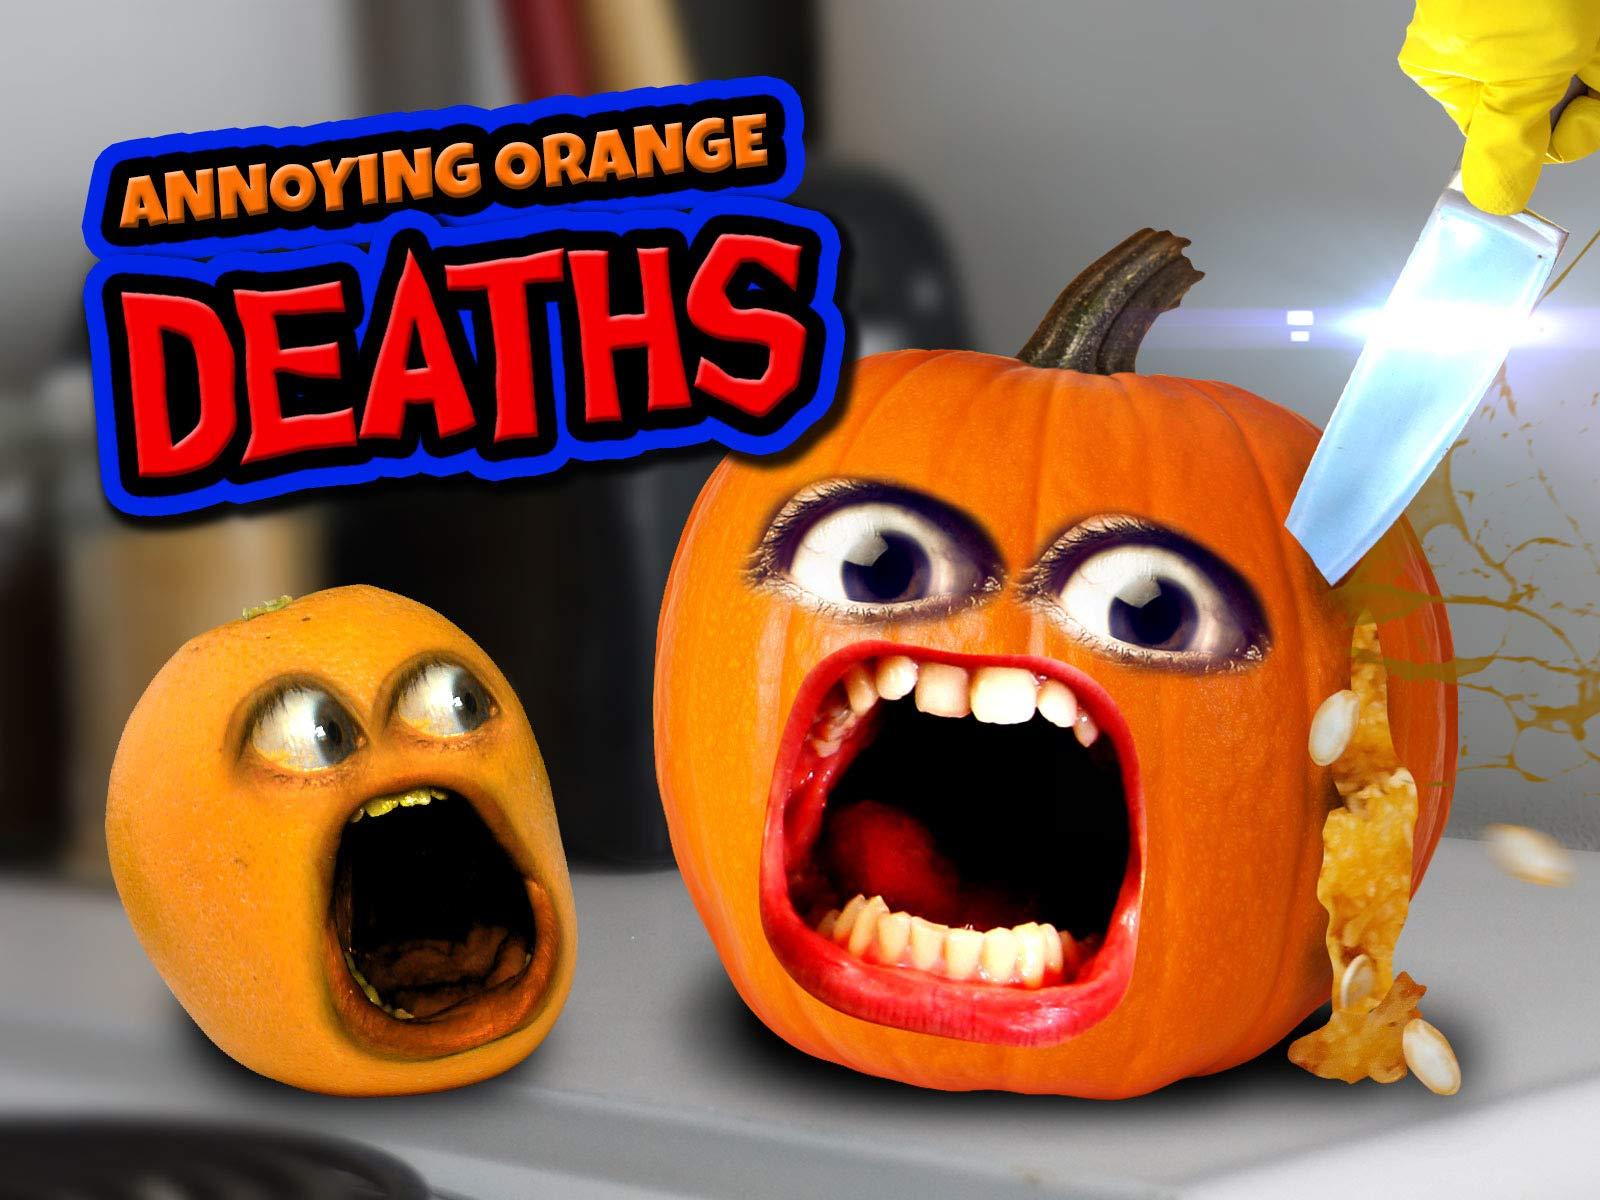 Clip: Annoying Orange Deaths on Amazon Prime Instant Video UK